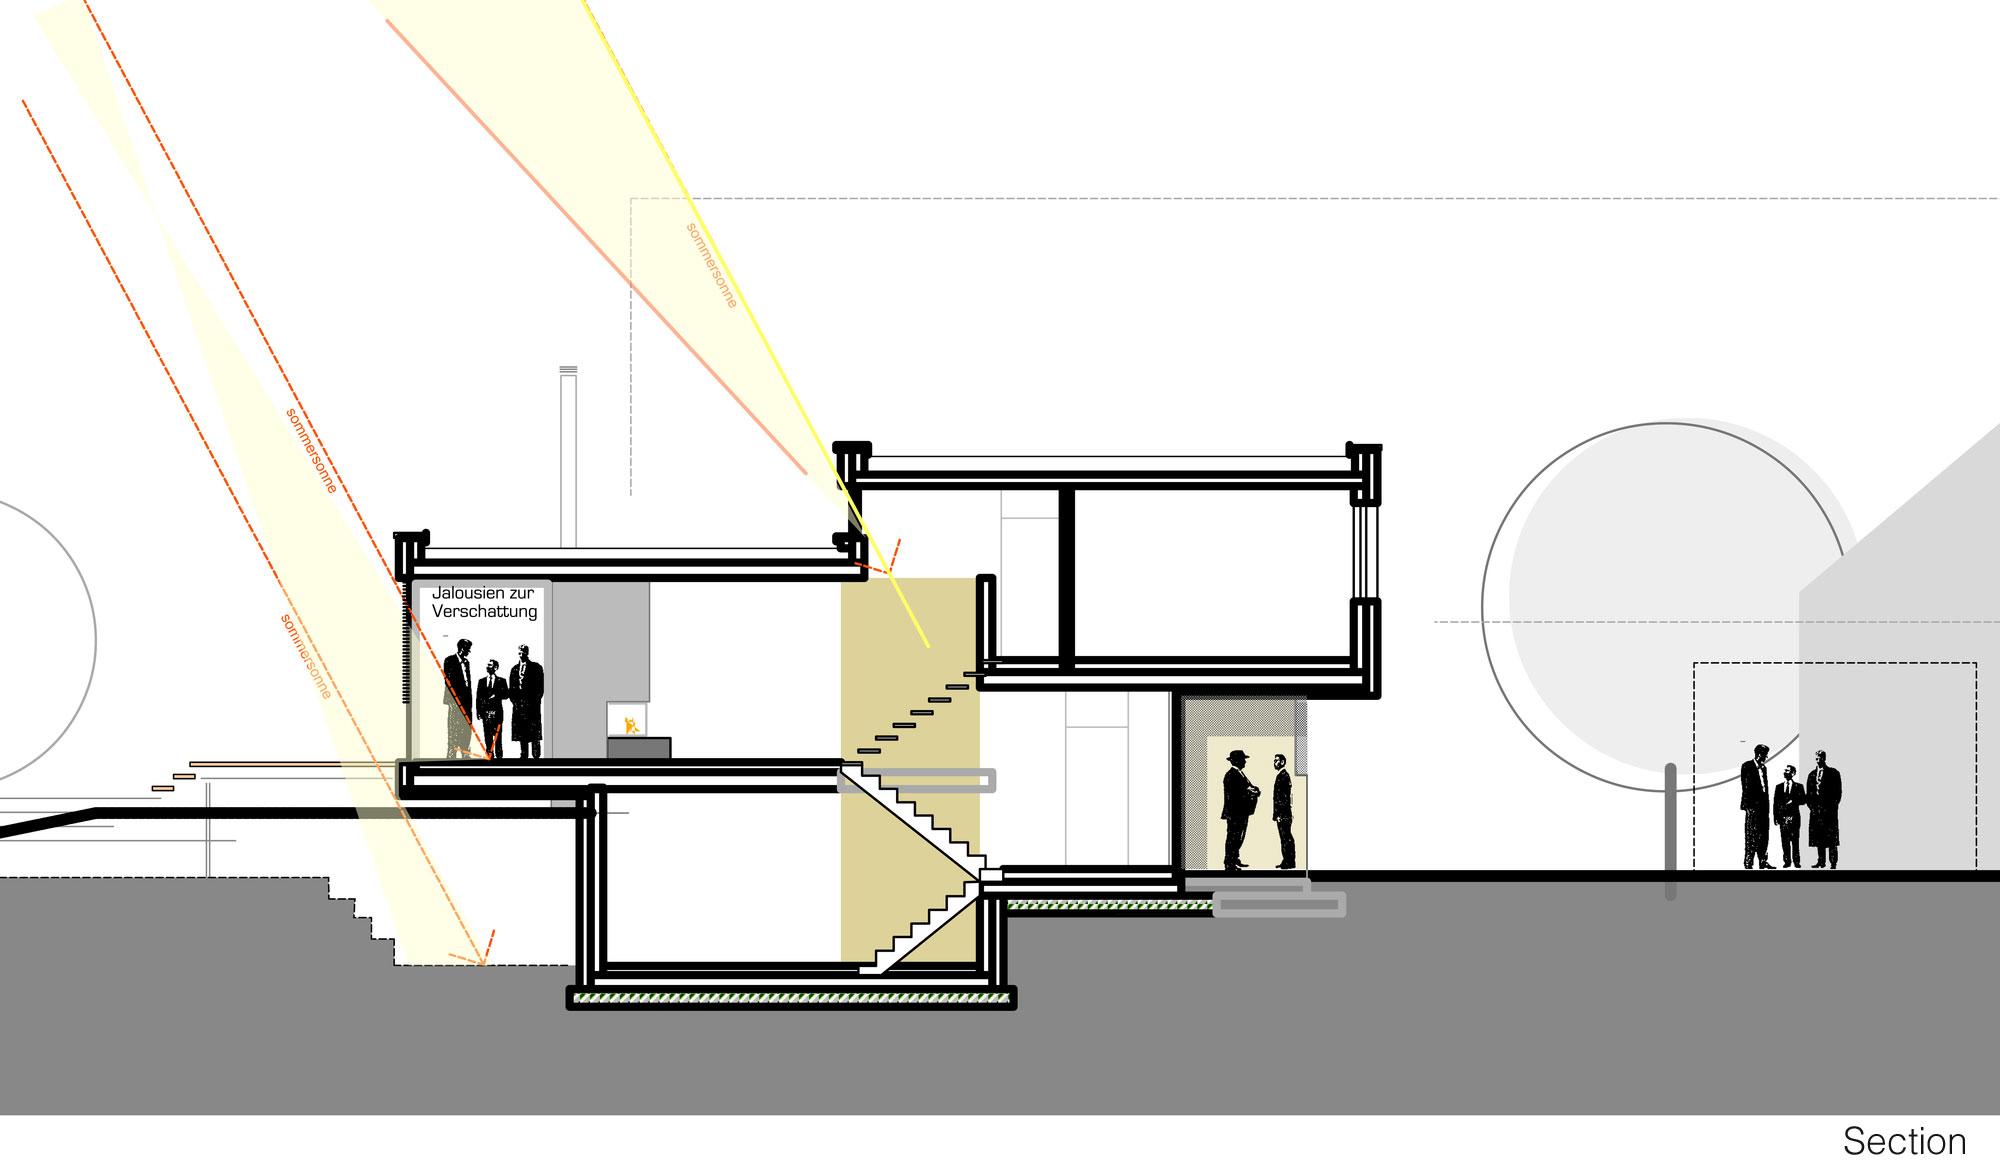 split level ranch house plans printable house plans ideas bedroom split level house plans split level ranch house plans